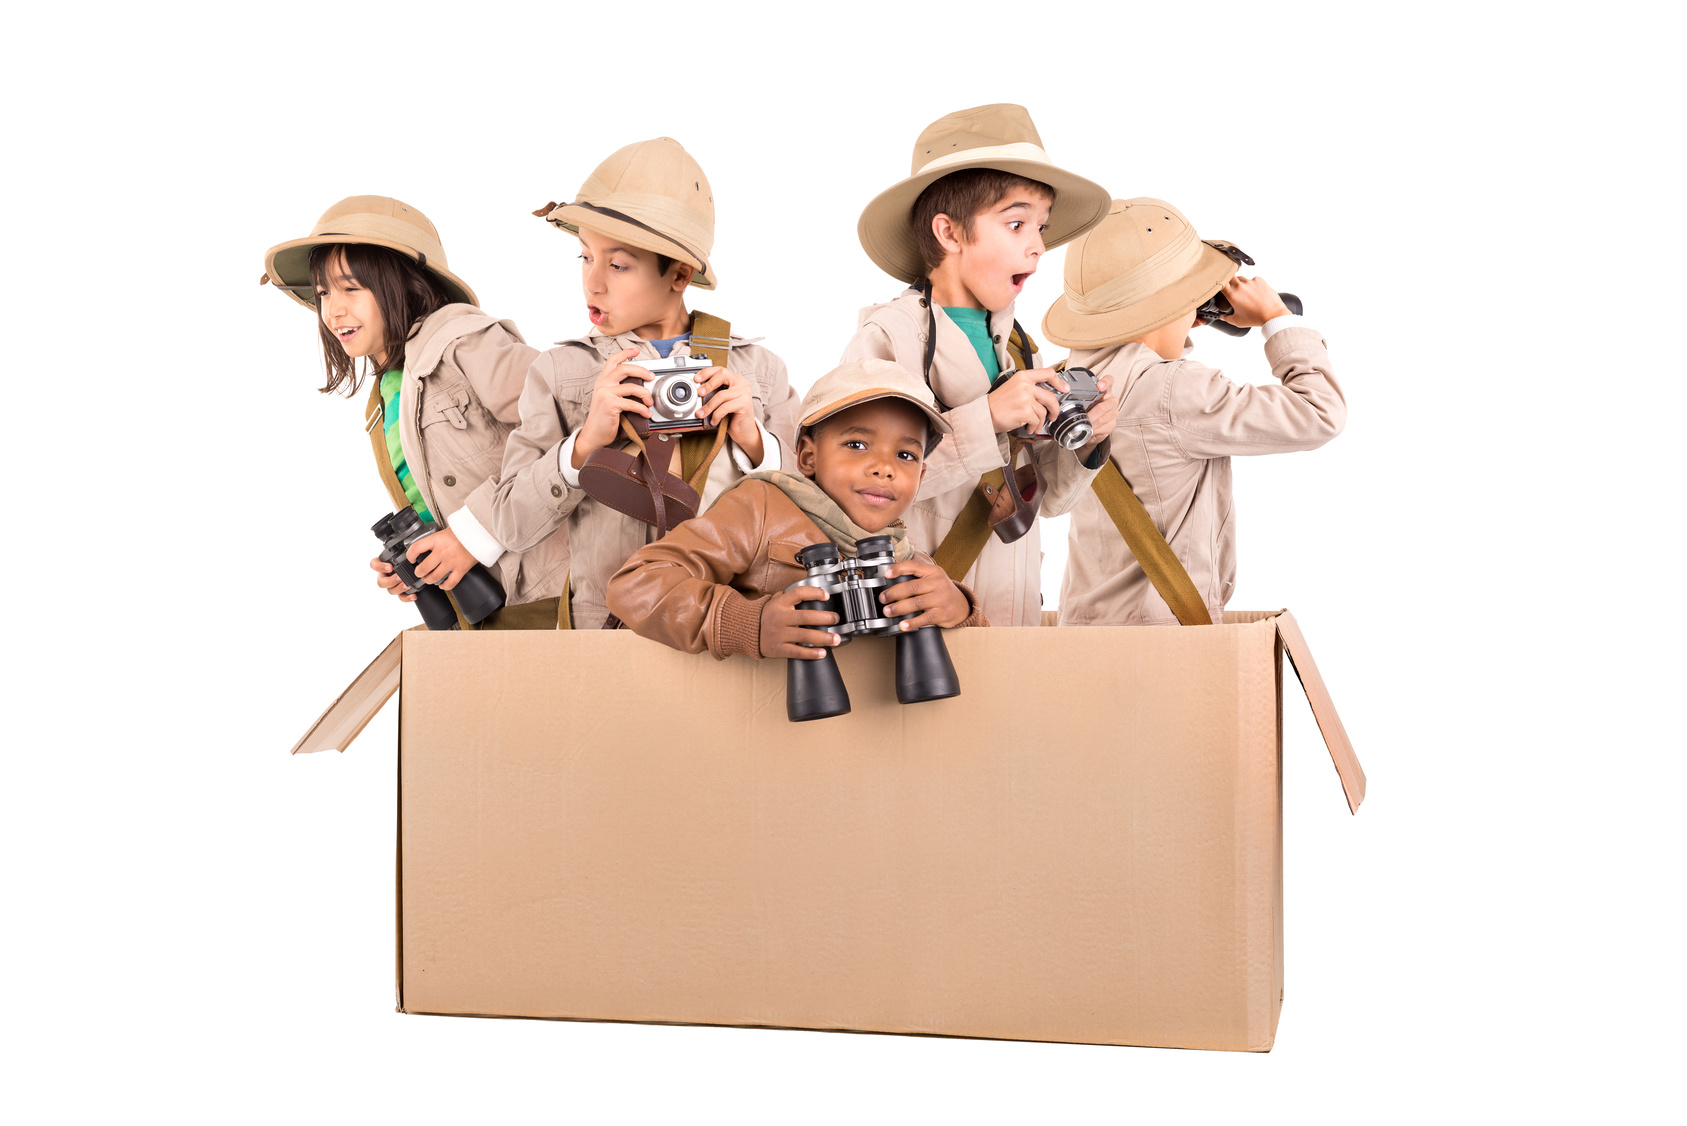 Children's group in a cardboard box playing safari